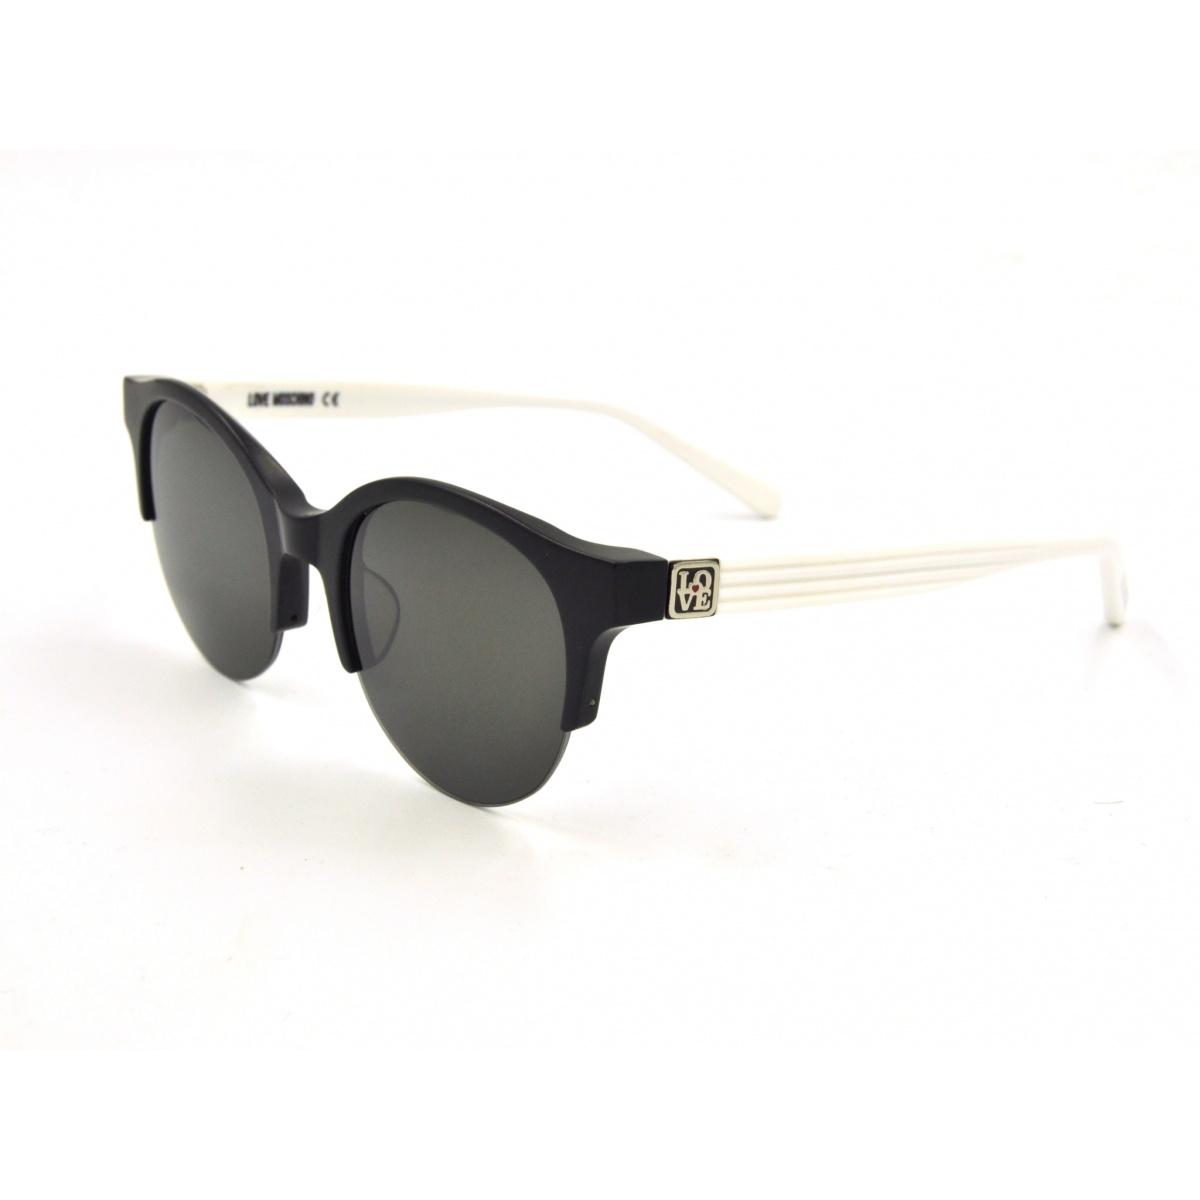 MOSCHINO ML587 S02l Sunglasses 2020